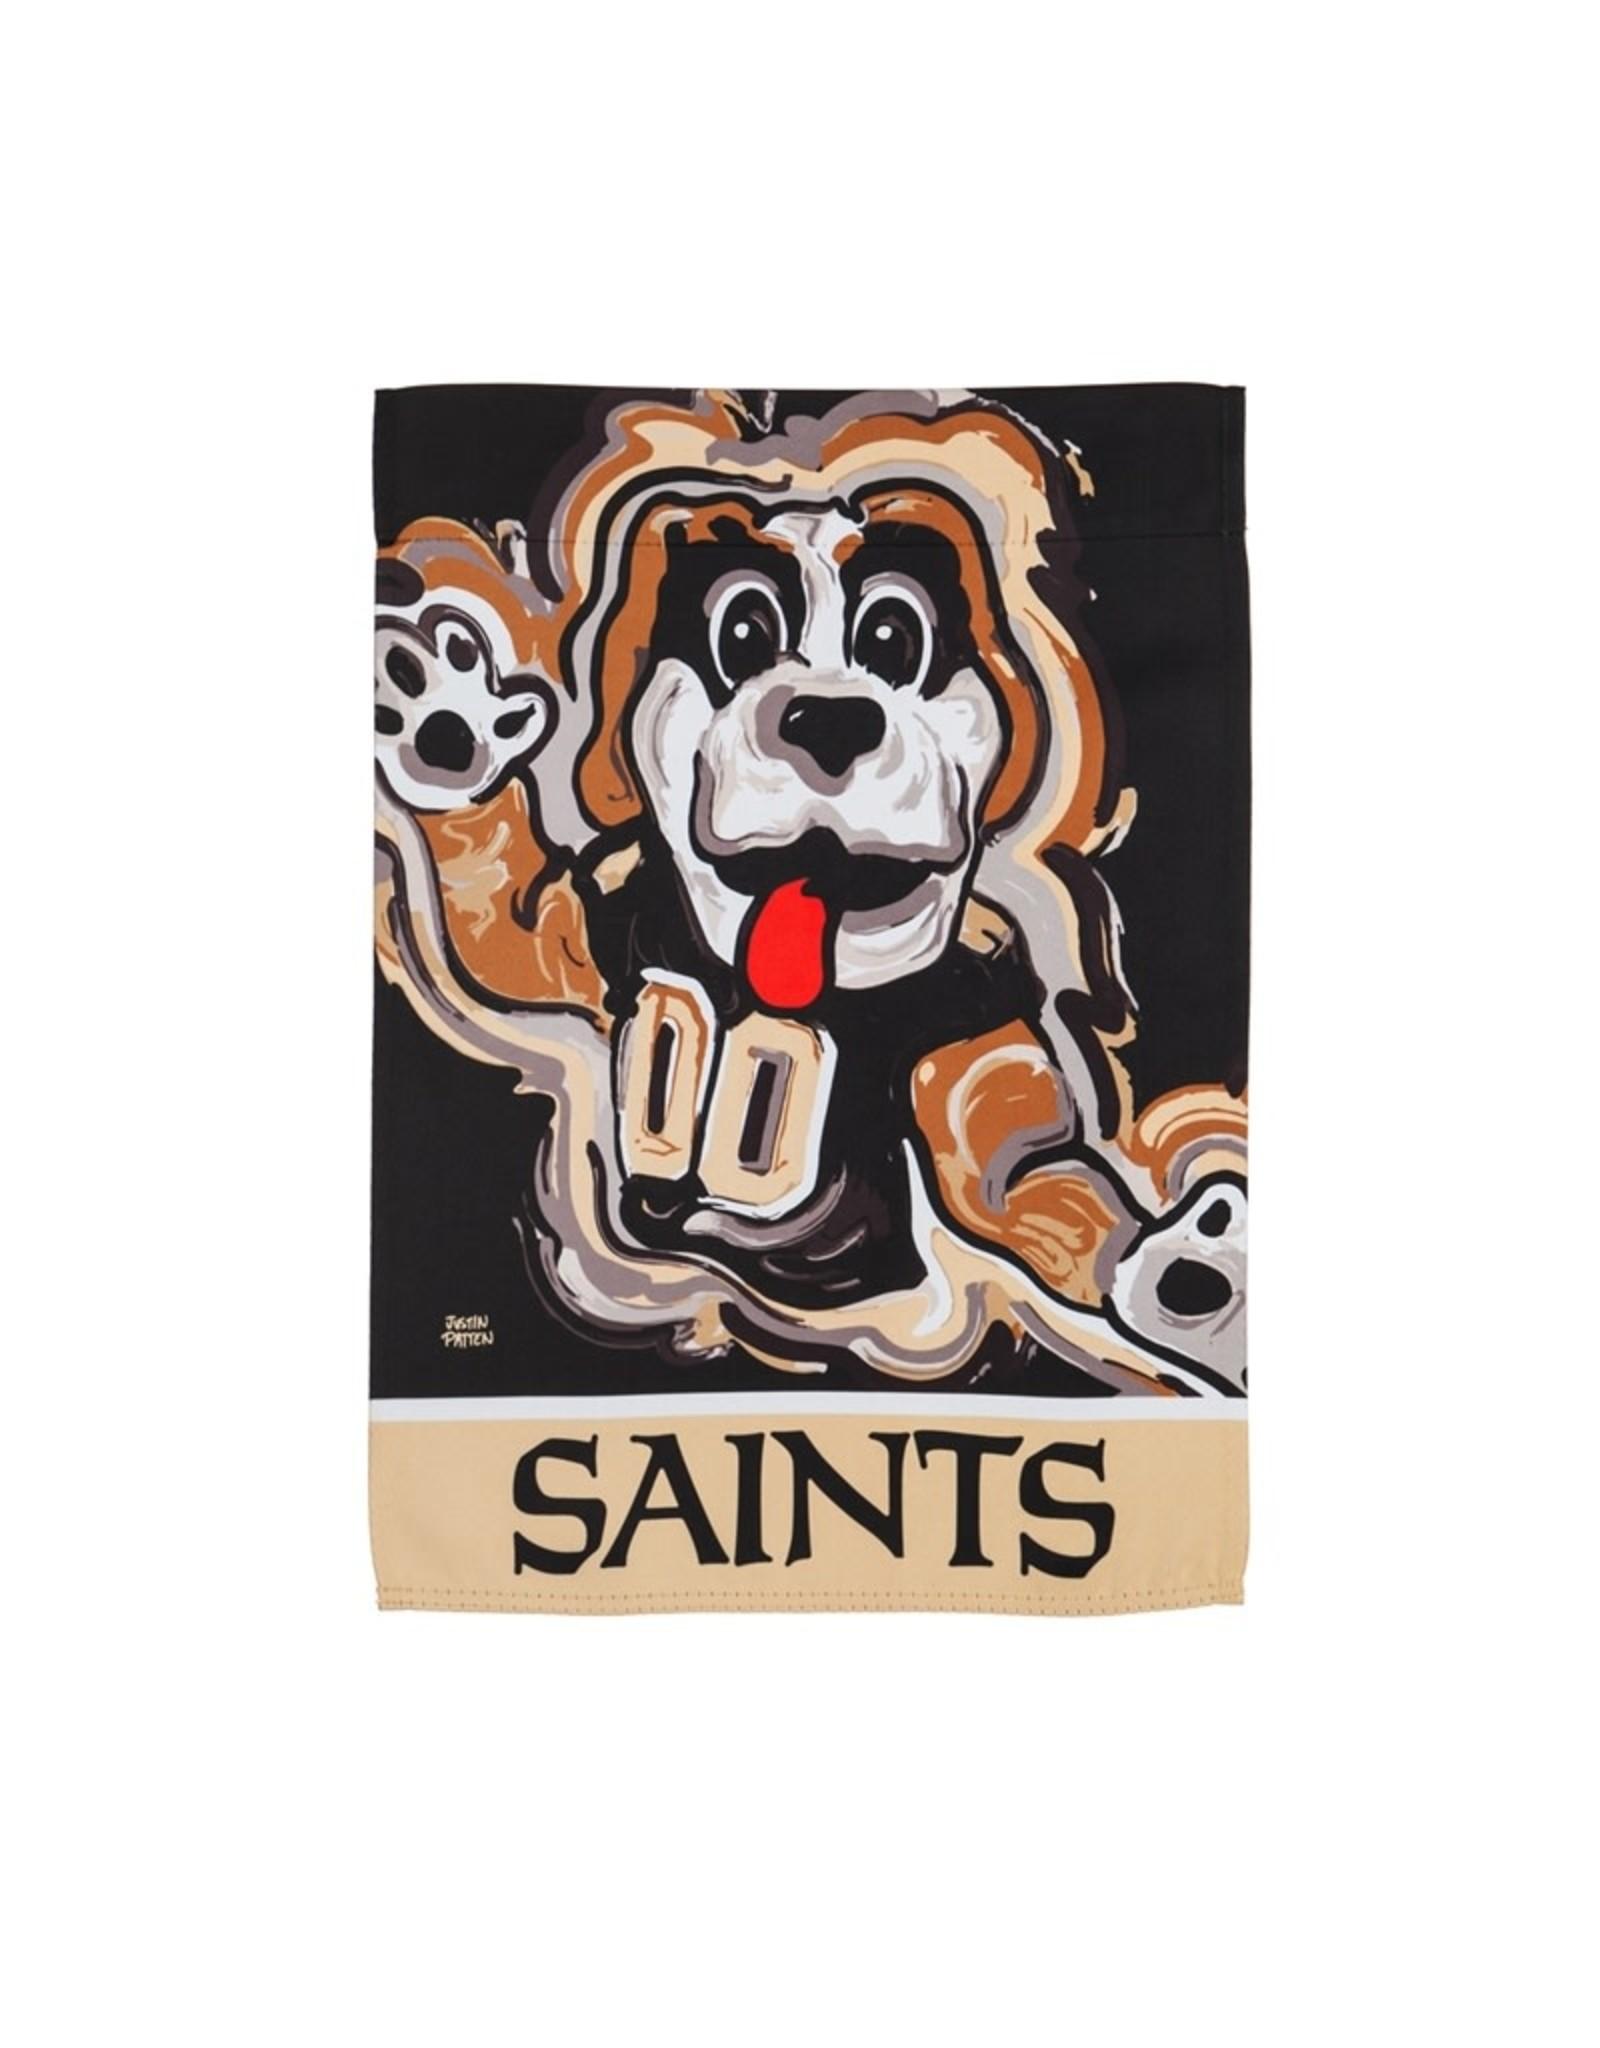 Evergreen Enterprises New Orleans Saints, Suede GDN Justin Patten